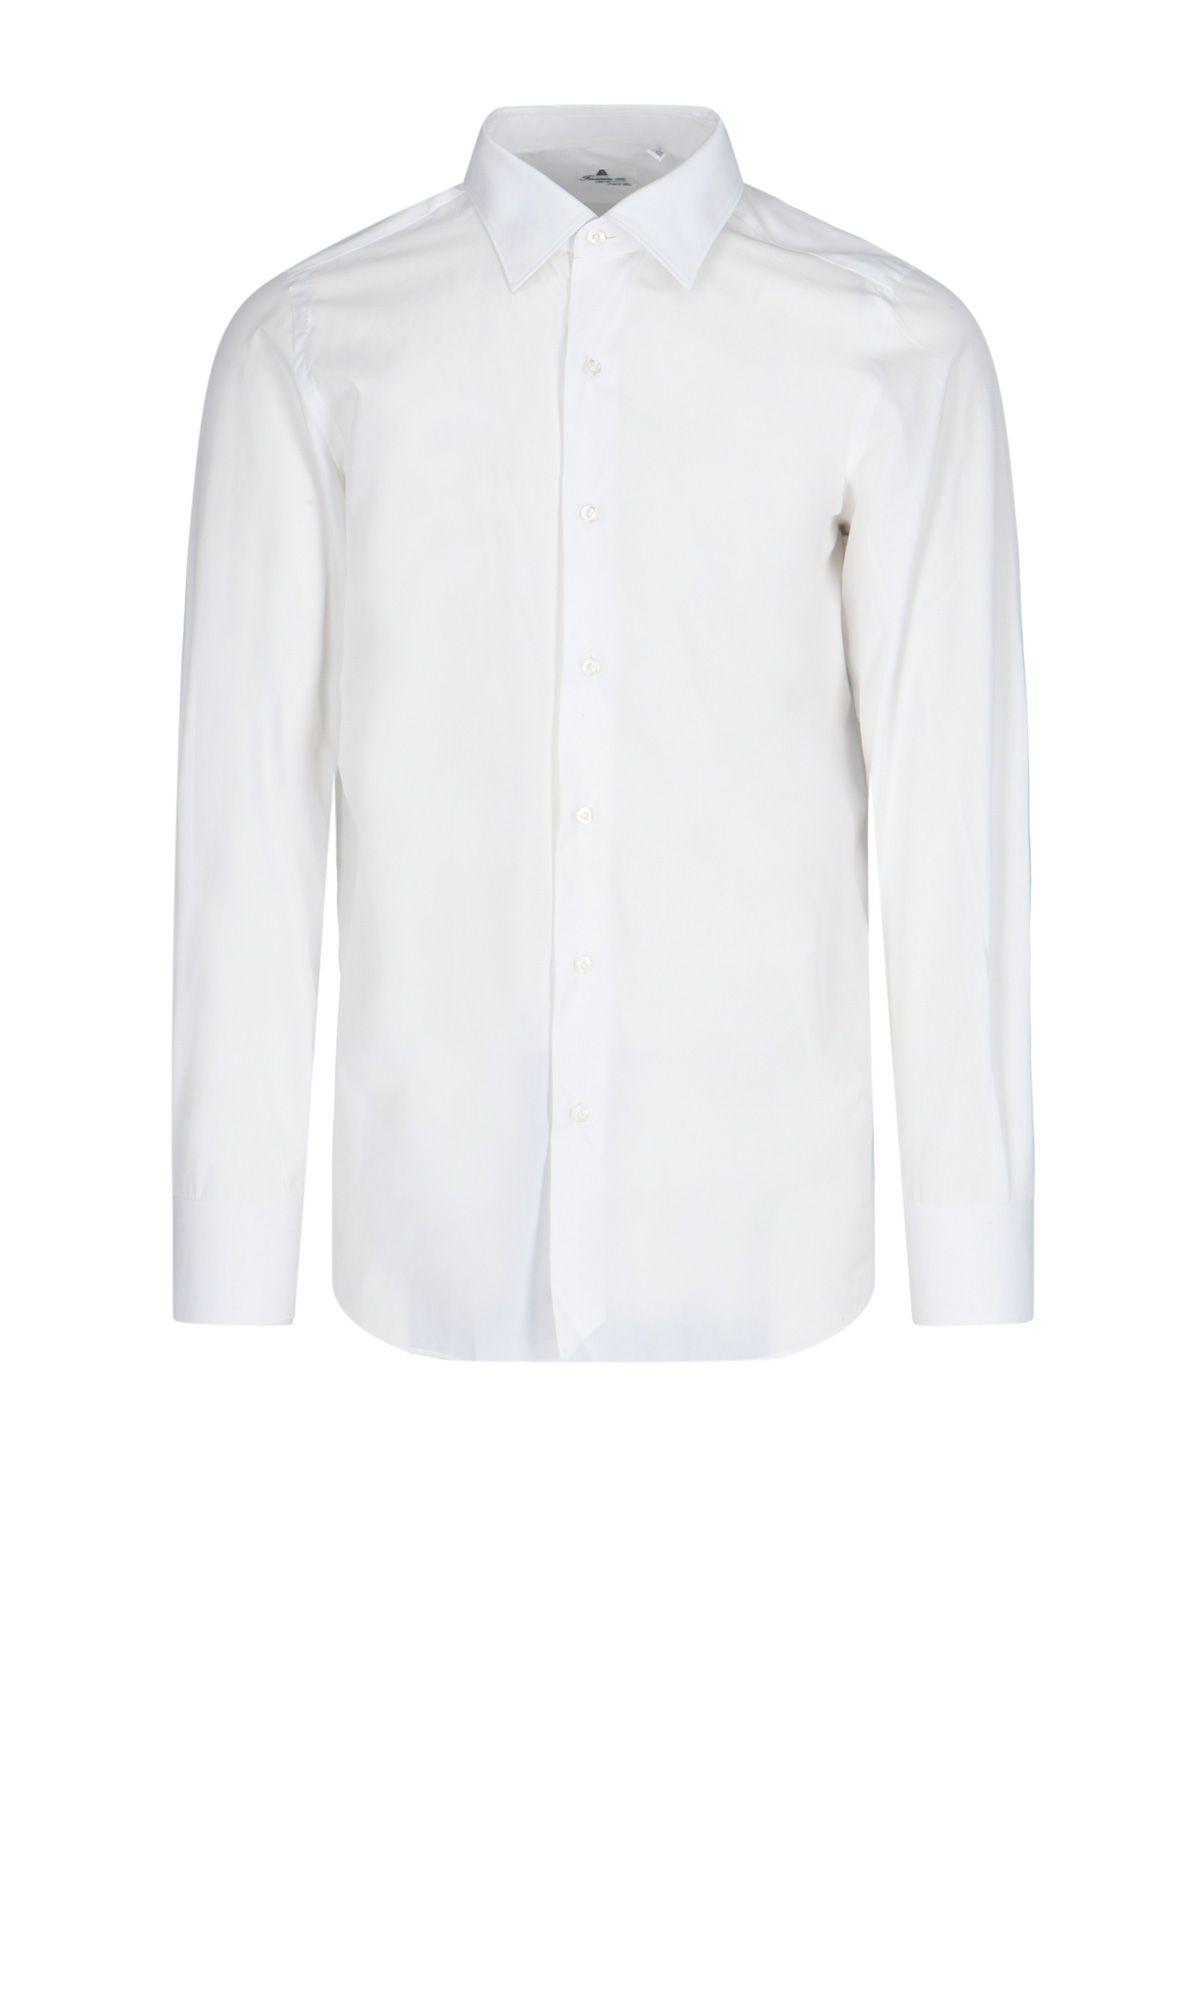 Finamore Cottons FINAMORE MEN'S WHITE COTTON SHIRT